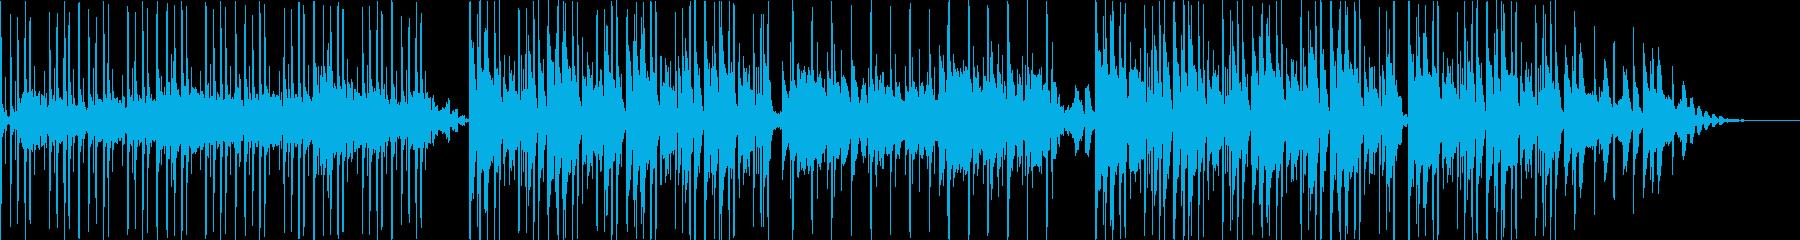 HipHopグルーヴのゆったりエレクトロの再生済みの波形